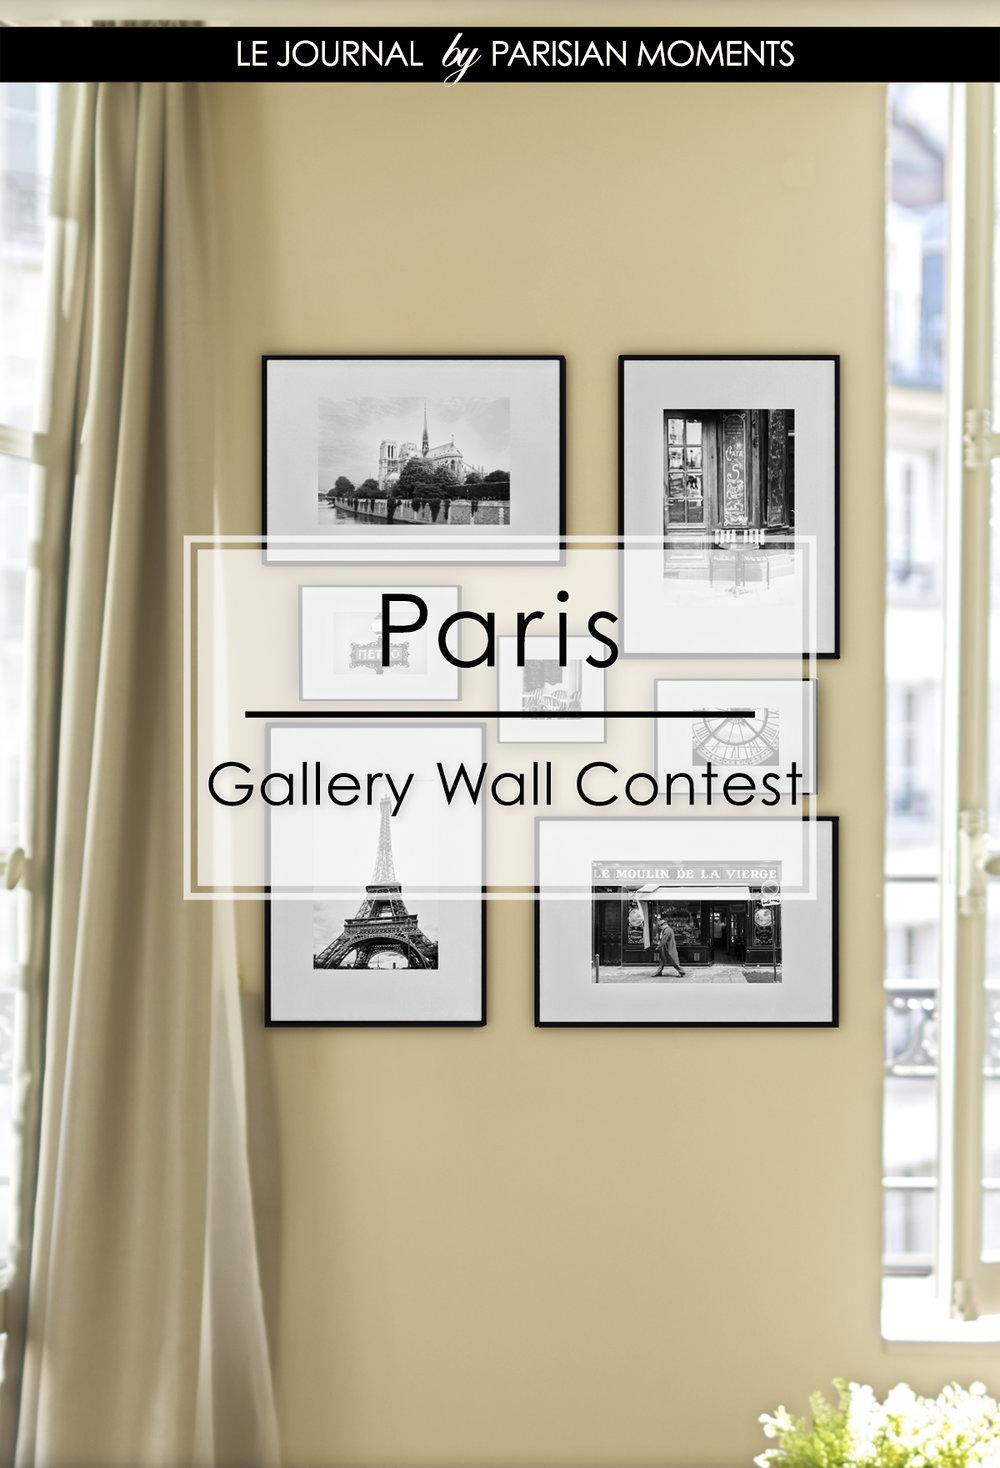 GalleryWallContestCover.jpg